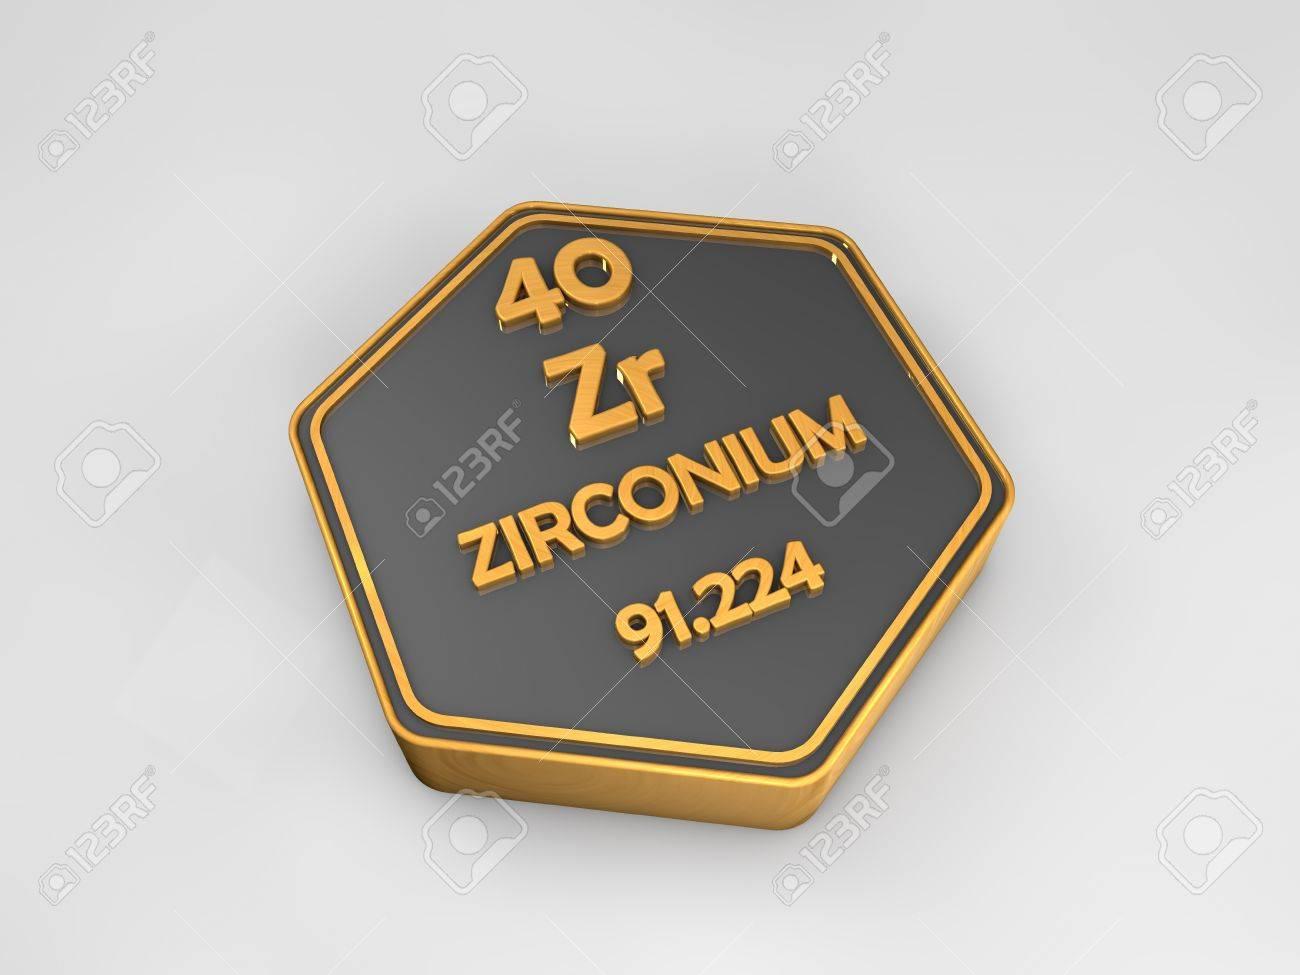 Zr element periodic table gallery periodic table images zirconium zr chemical element periodic table hexagonal shape zirconium zr chemical element periodic table hexagonal shape gamestrikefo Images